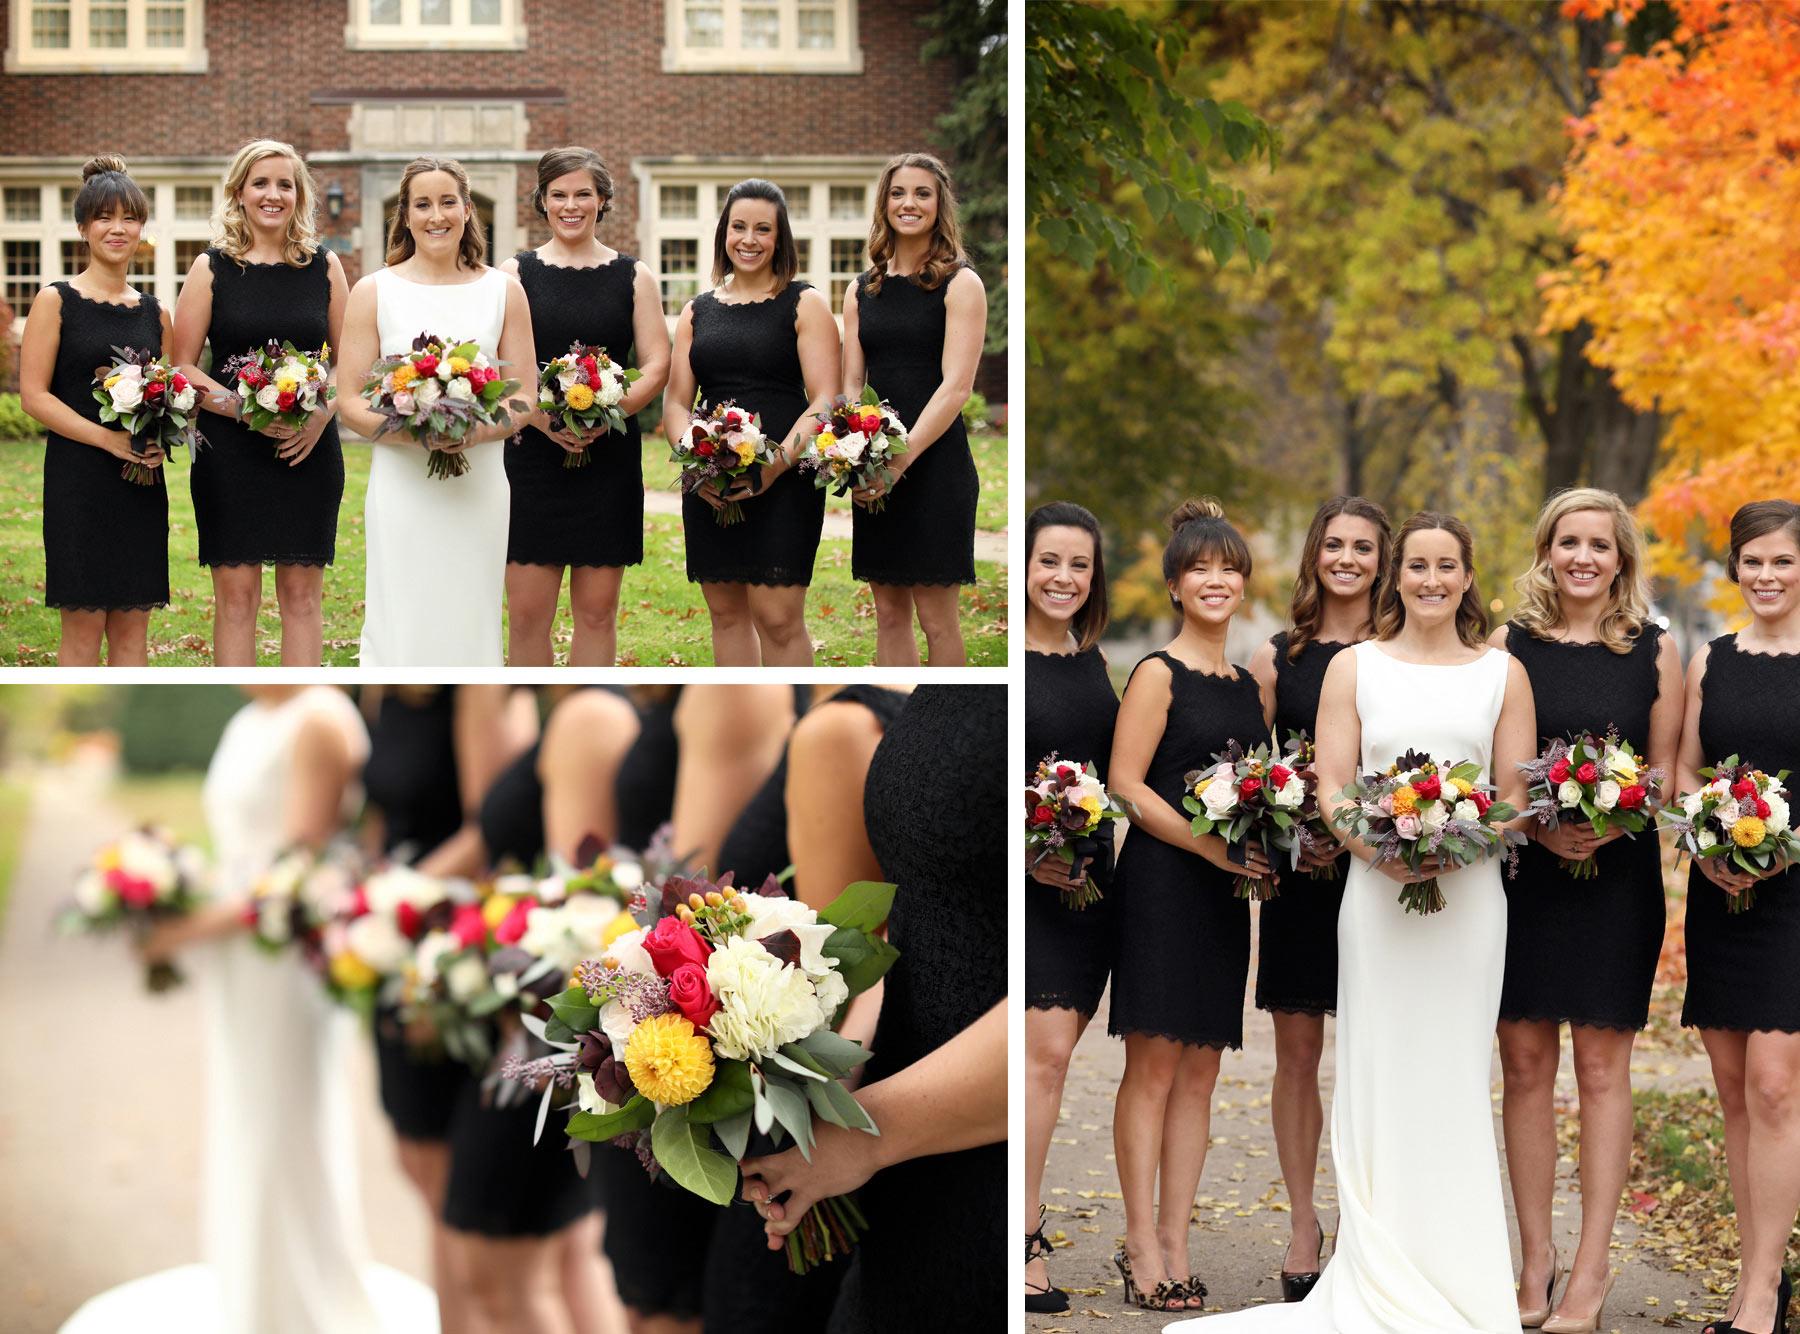 04-Saint-Paul-Minnesota-Wedding-Photographer-by-Andrew-Vick-Photography-Fall-Autumn-Parents-House-Bride-Bridesmaids-Flowers-Kathryn-and-Sam.jpg